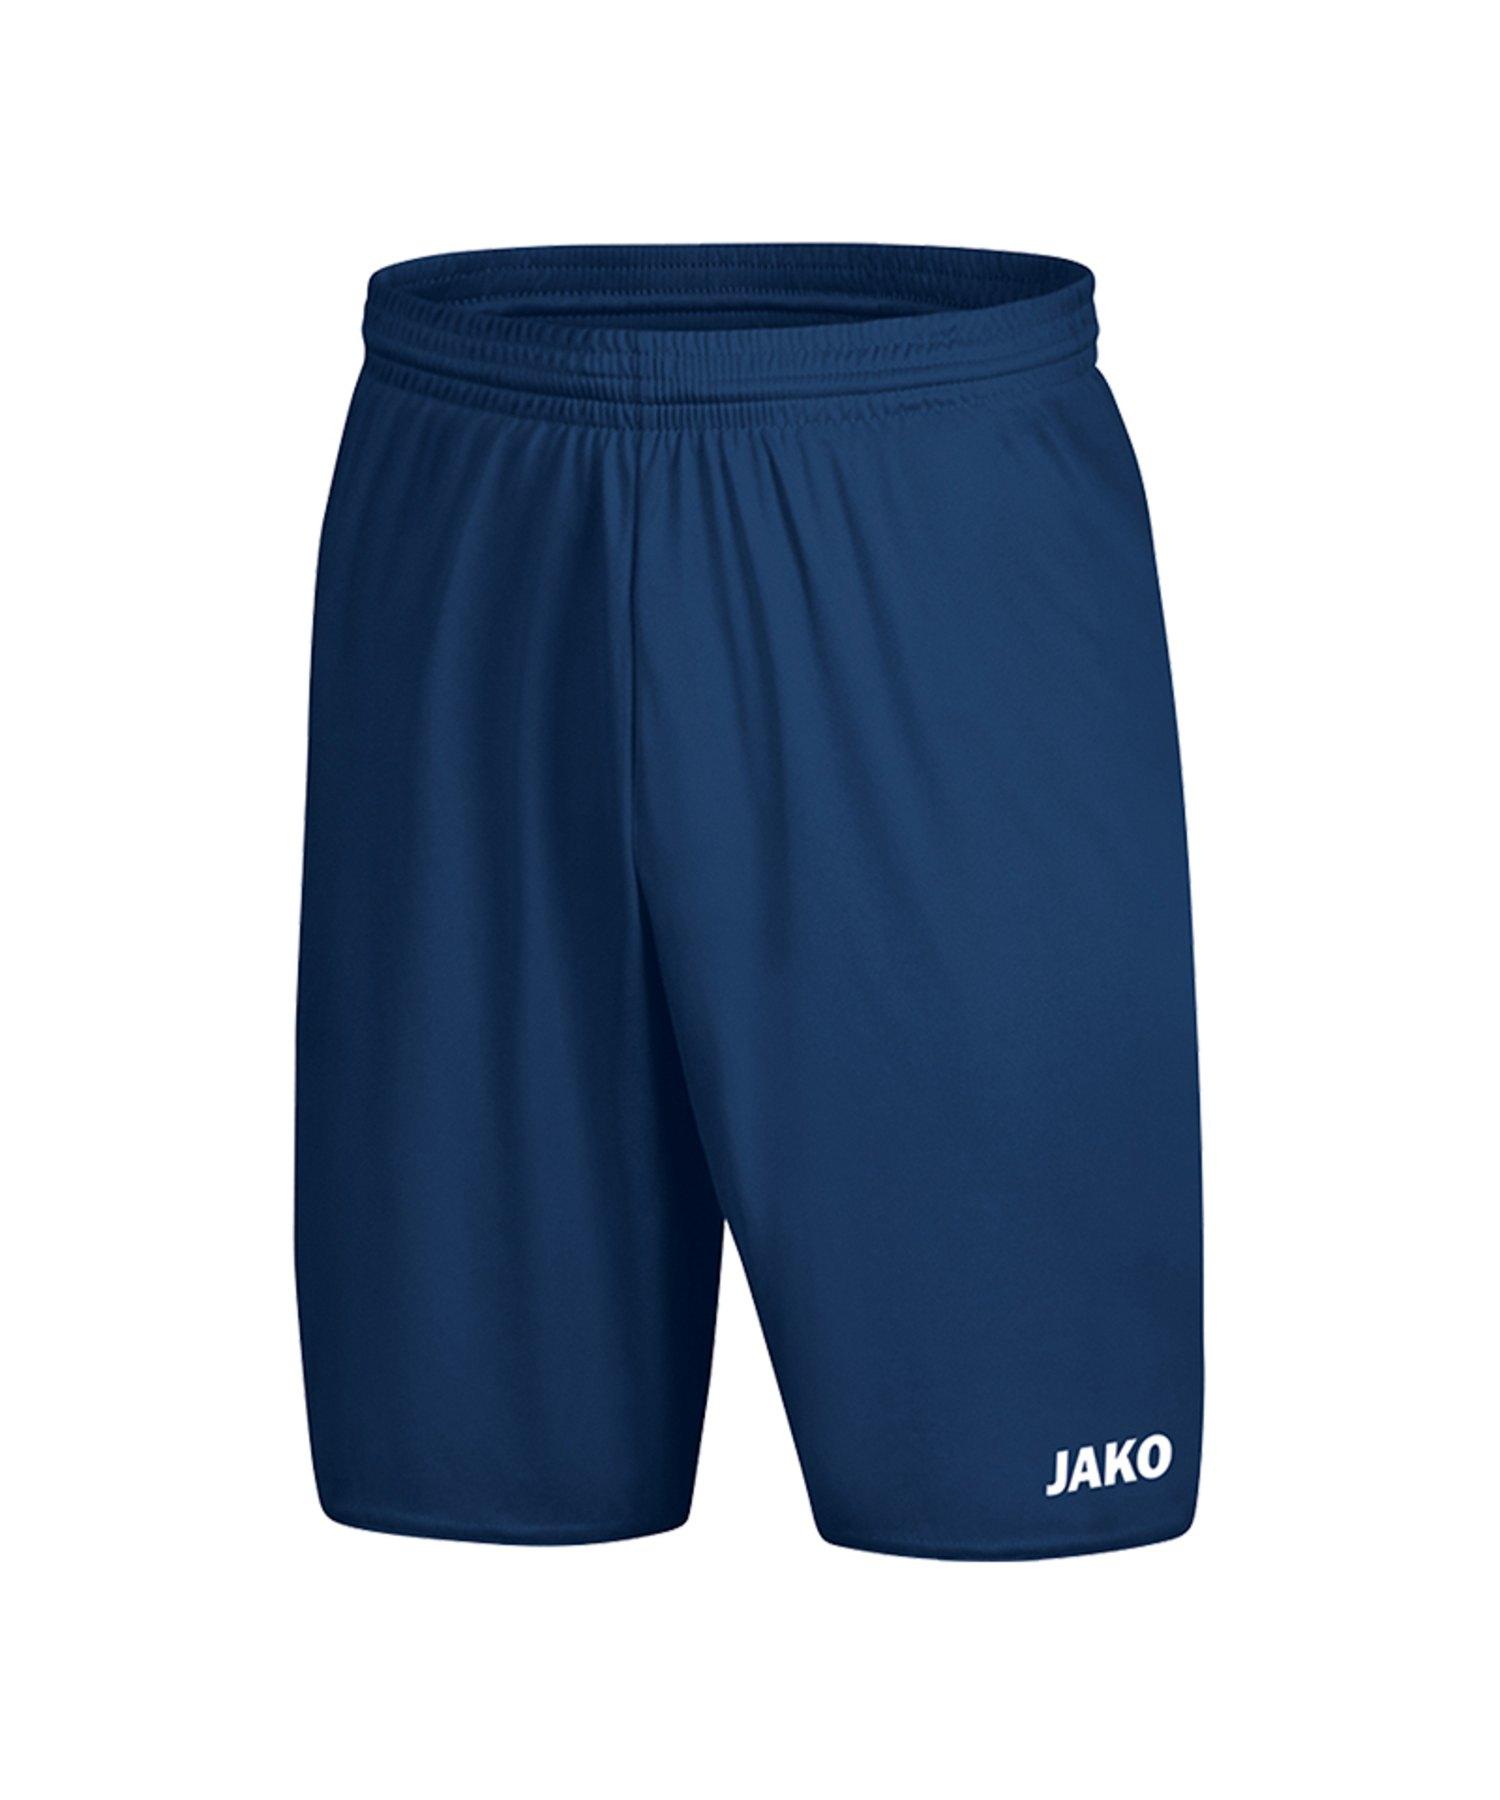 Jako Anderlecht 2.0 Short Hose kurz Kids Blau F09 - Blau